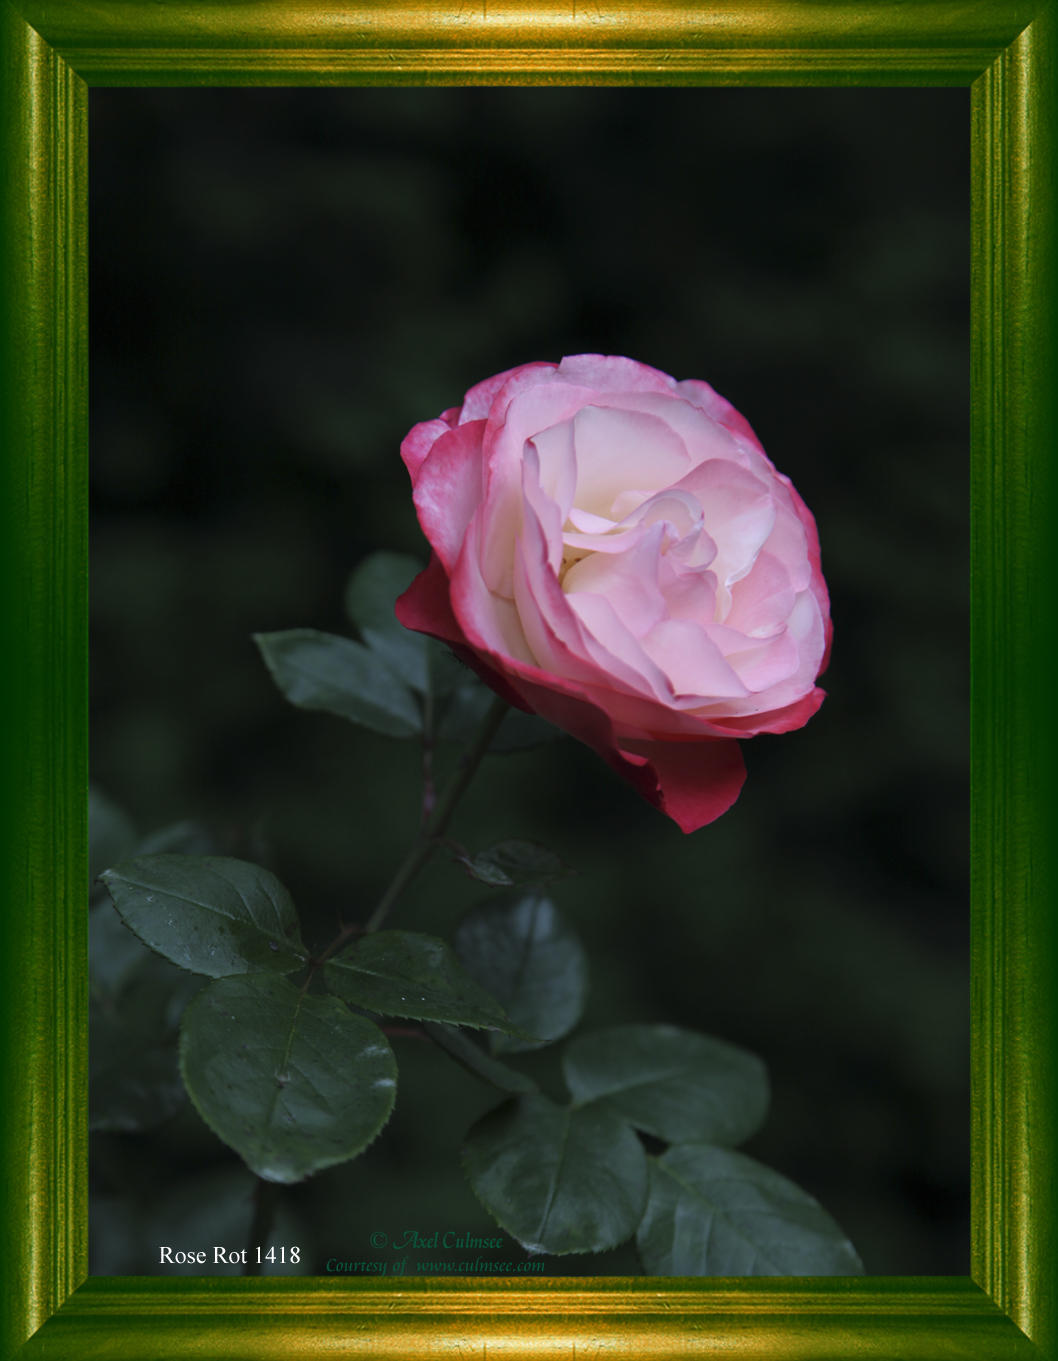 Rose Rot 1418